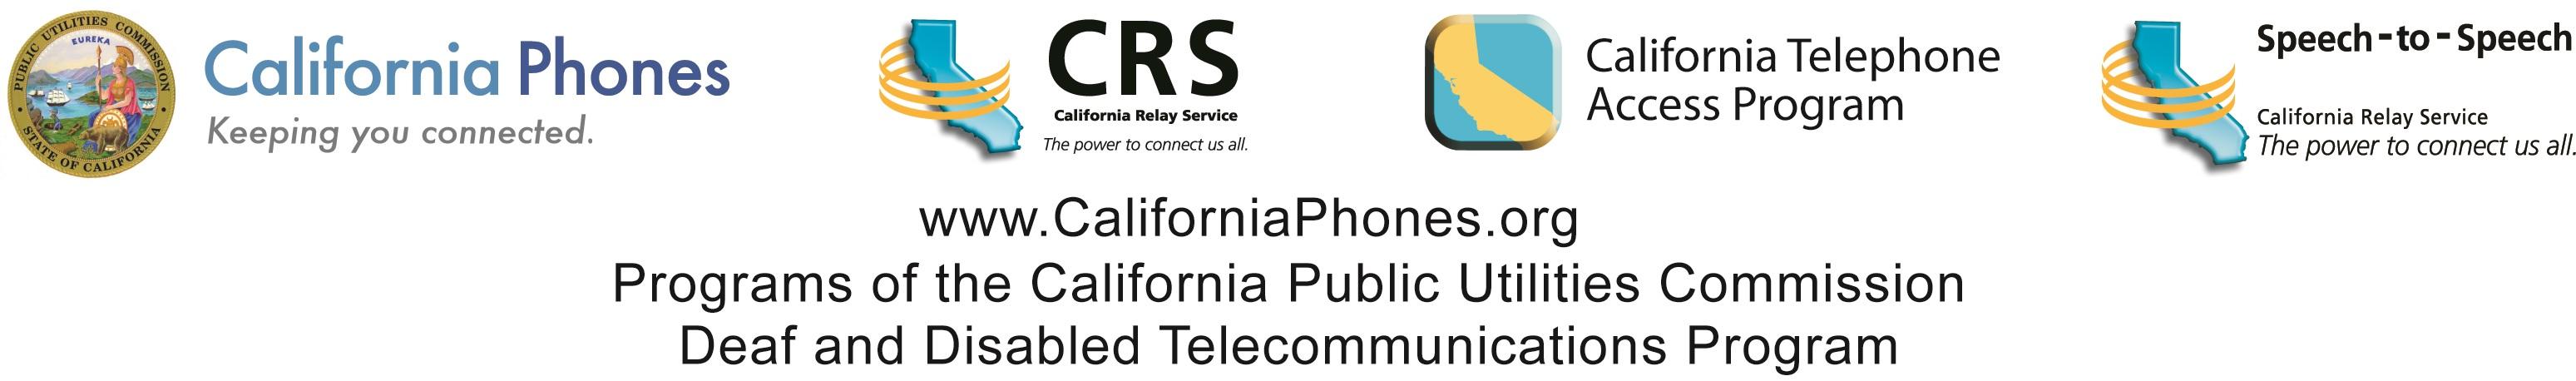 logos of California Phones, California Relay Service, California Telelphone Access Program and Speech  to-Speech